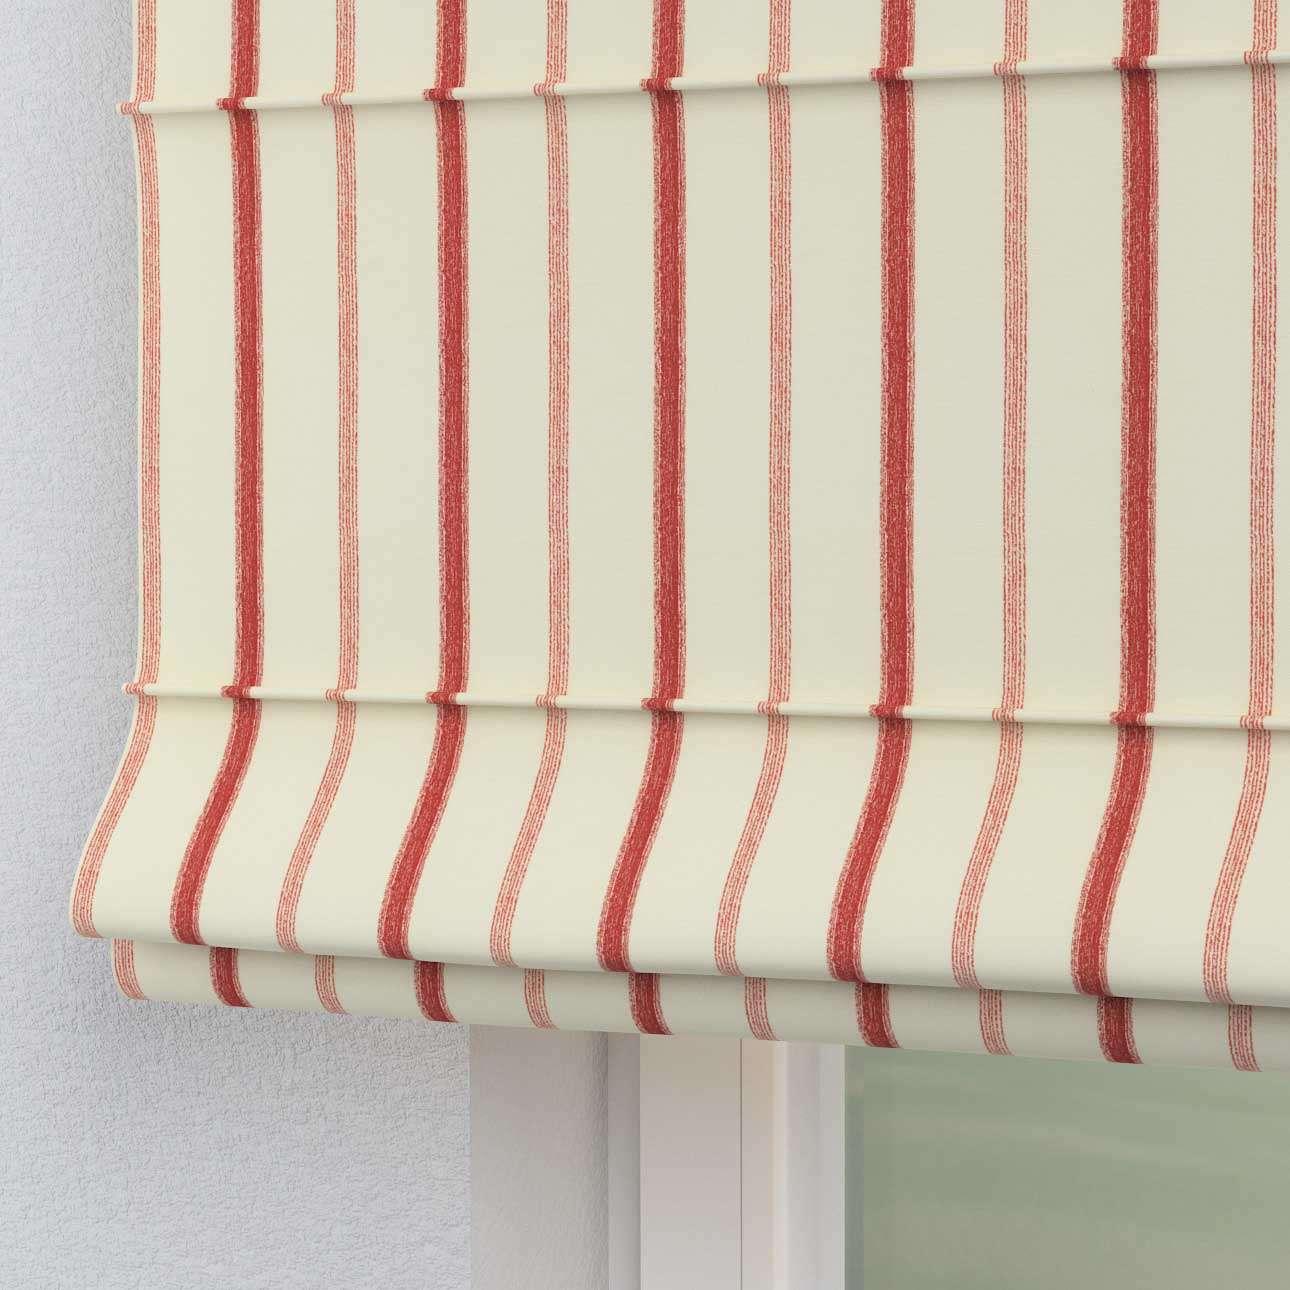 Foldegardin Verona<br/>Med stropper til gardinstang 80 x 170 cm fra kollektionen Avinon, Stof: 129-15